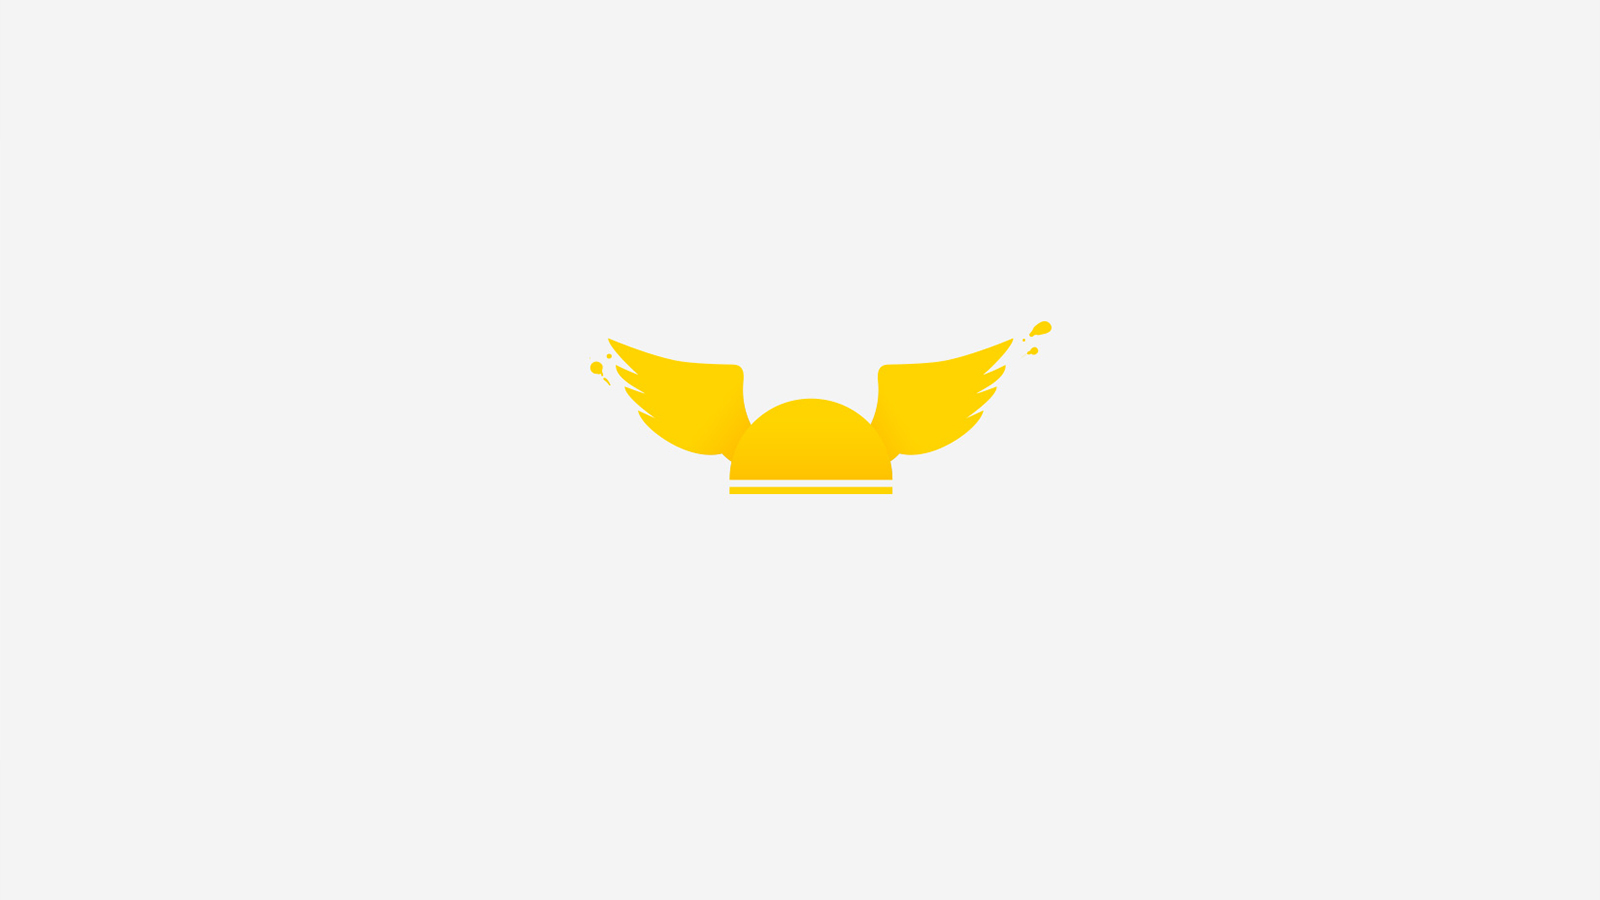 Logo design studio לוגו סטודיו לעיצוב Kapara